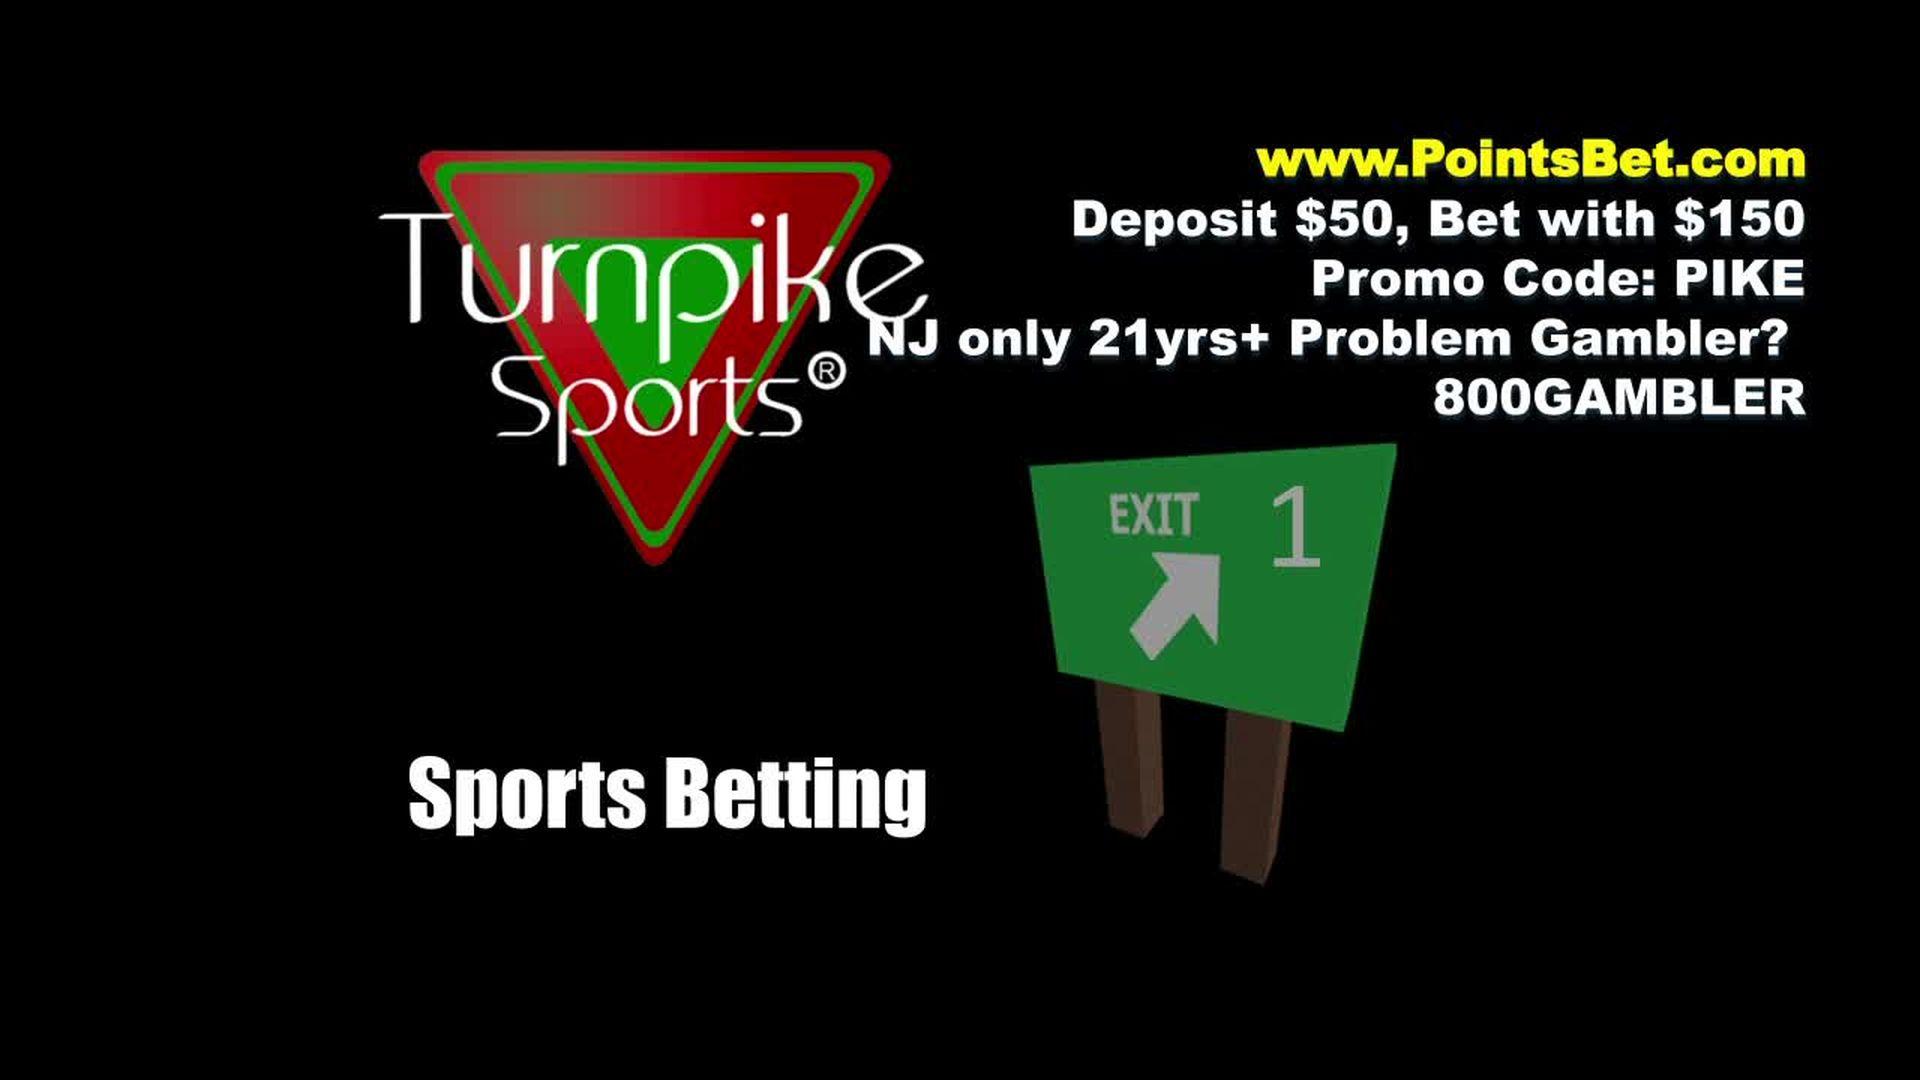 Turnpike Sports® - S 4 - Ep 3